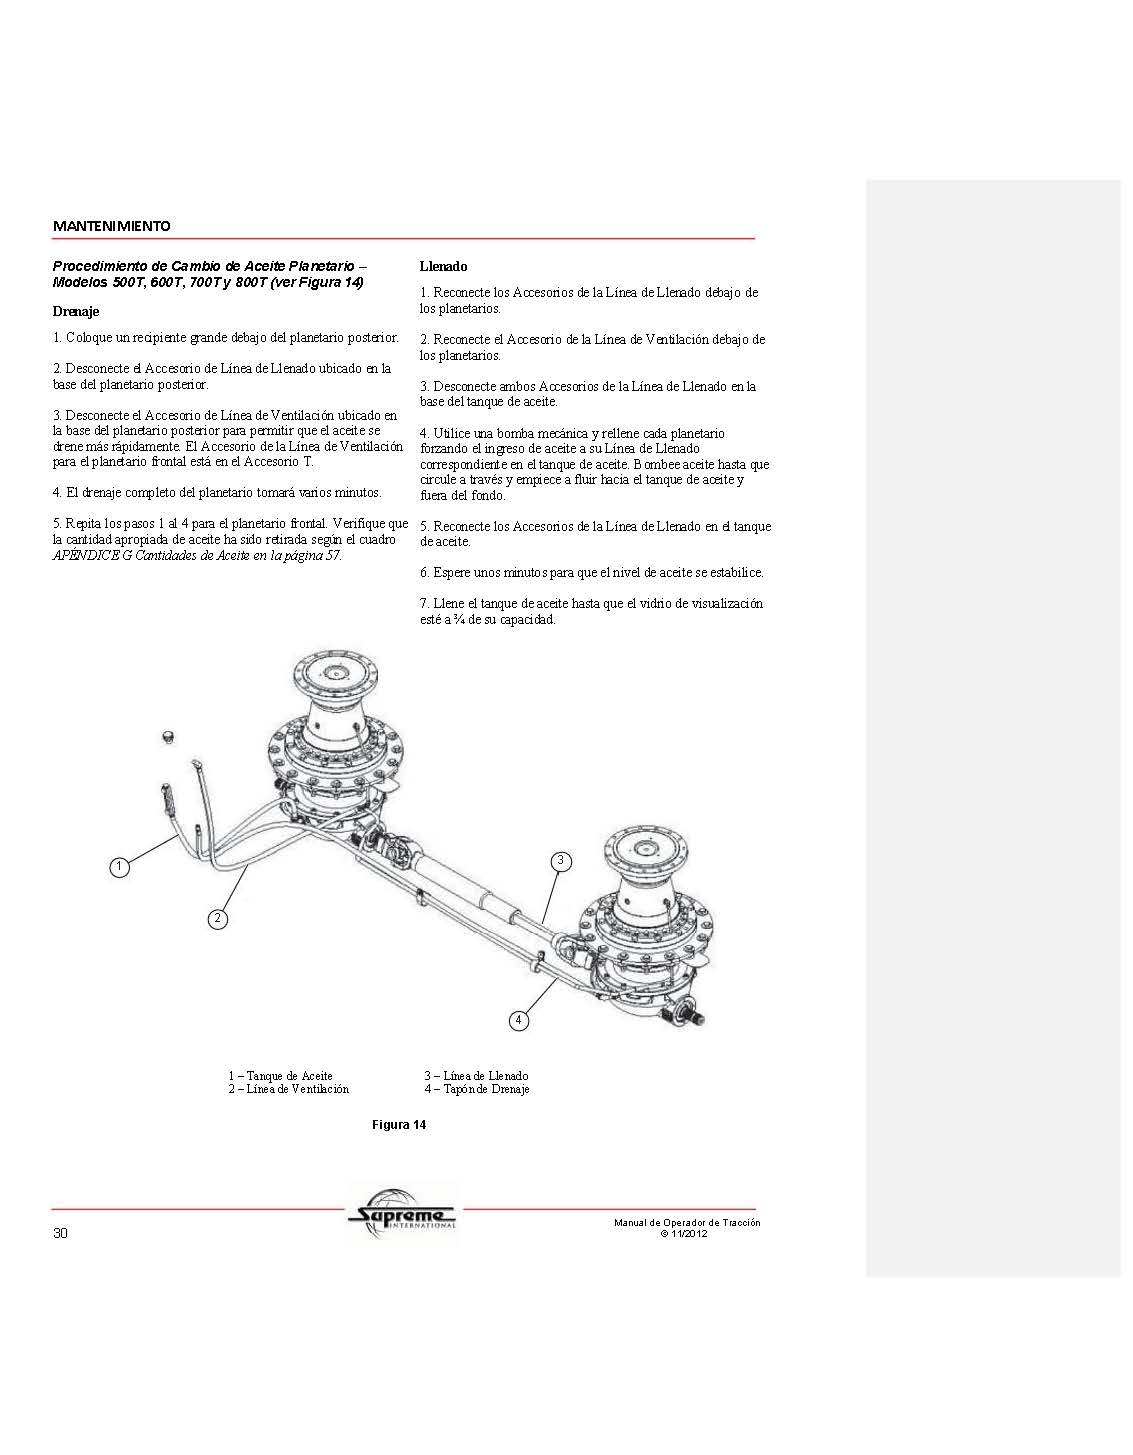 Technical Manual Translation Samples